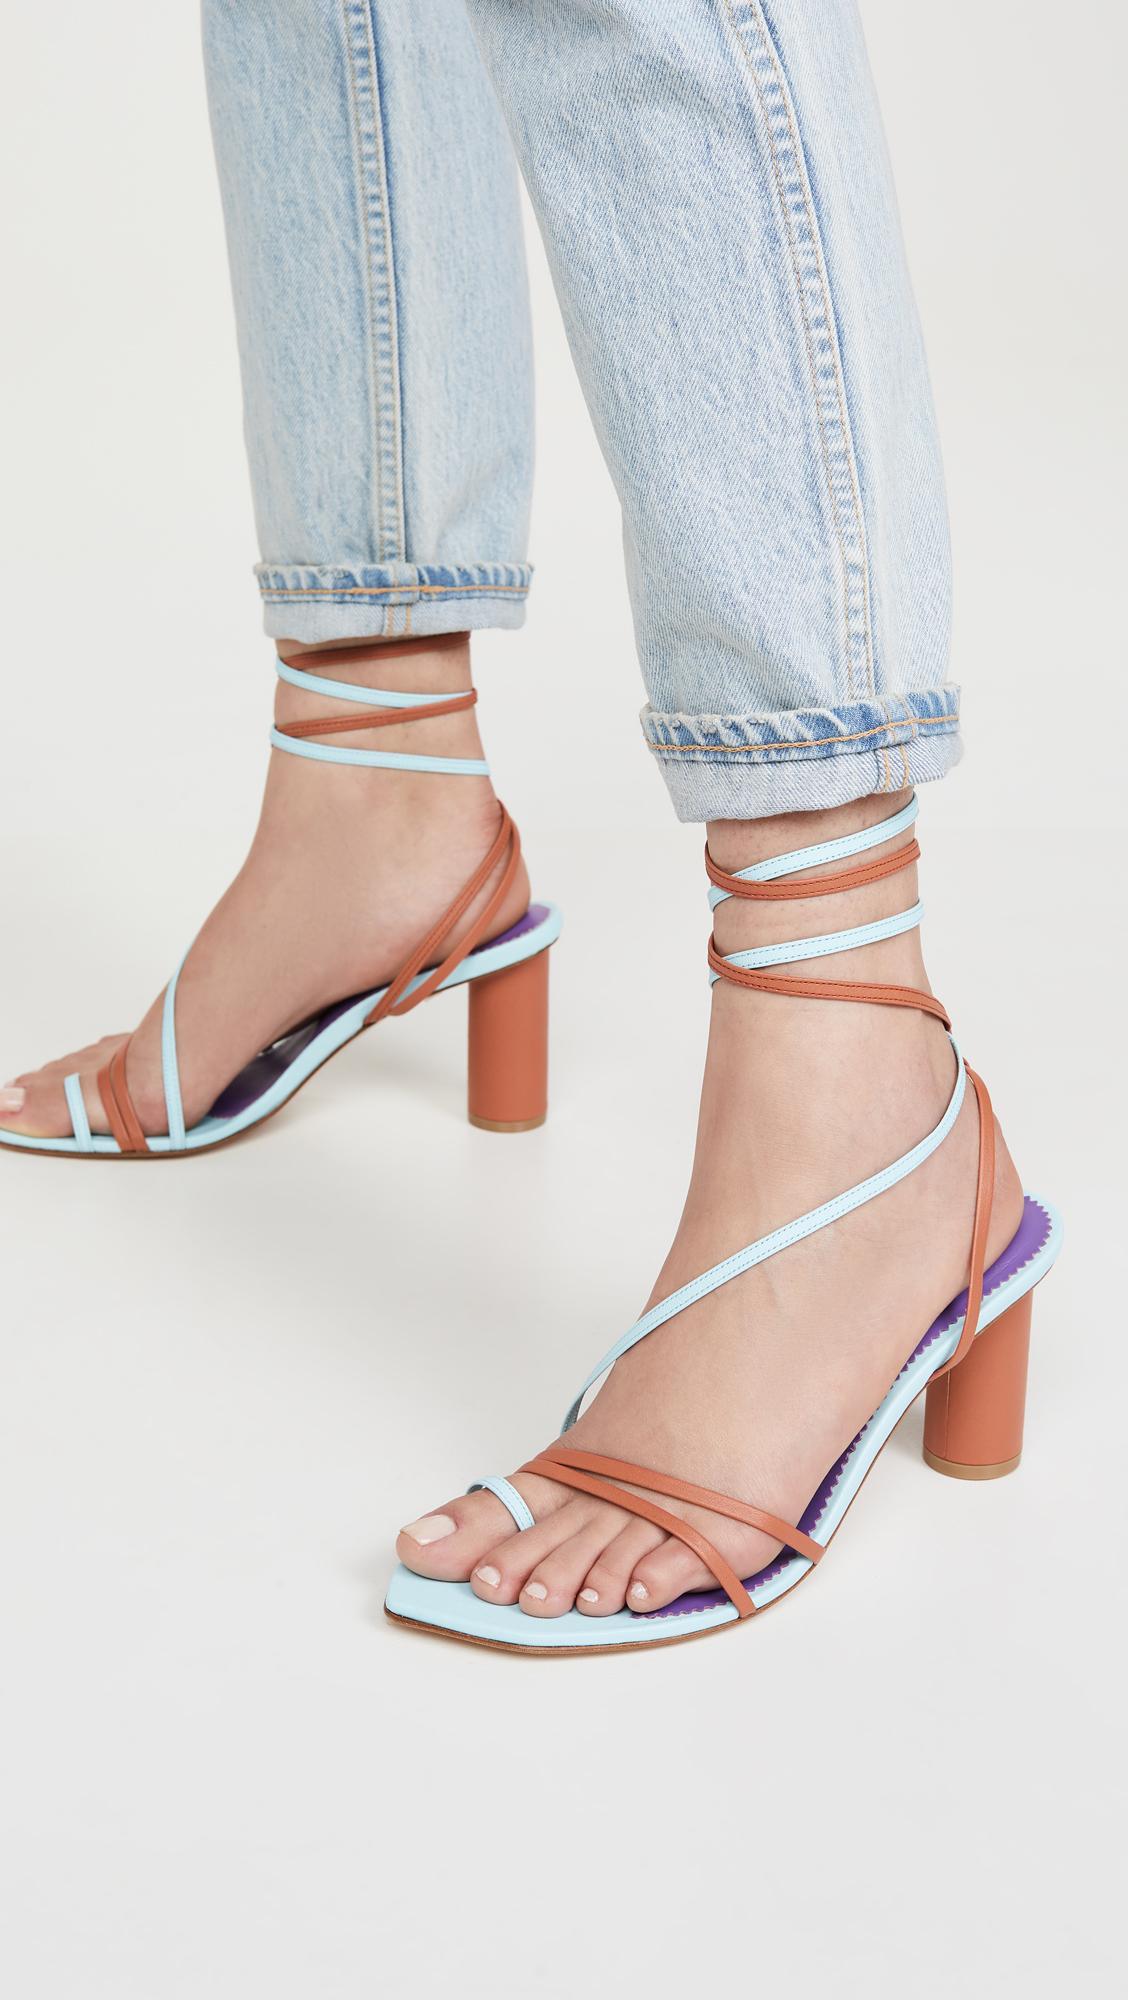 Emily Ratajkowski's Shoes Are Spring's Weirdest Sandal Trend 9